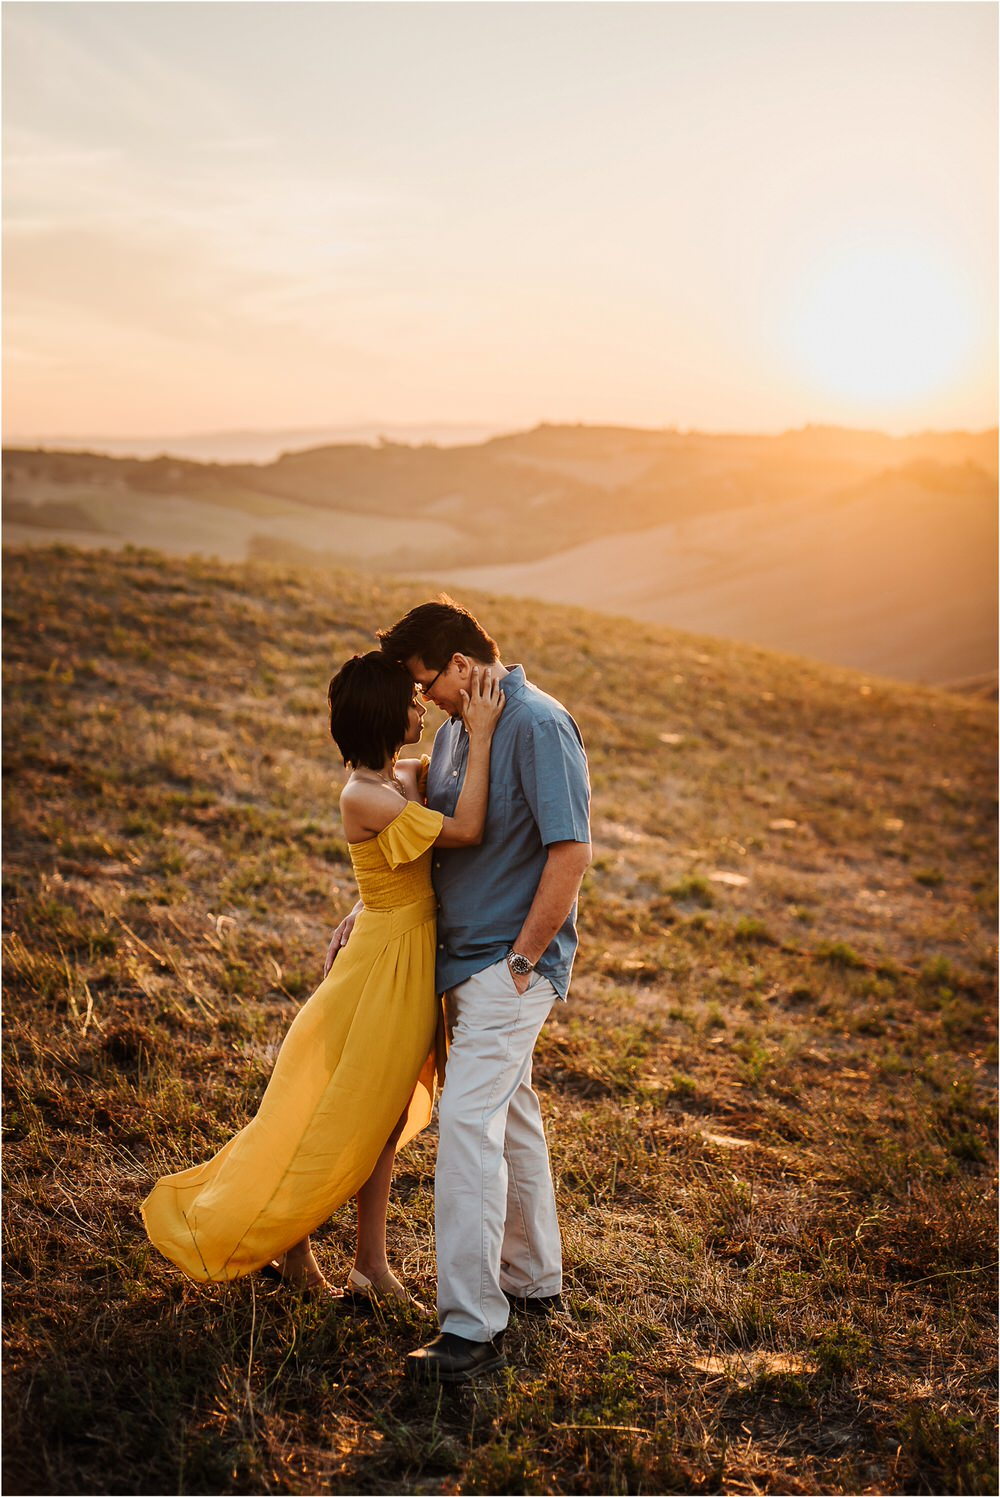 tuscany siena wedding anniversary honeymoon photography photographer italy matrimonio destination val d'orcia toscana 0071.jpg